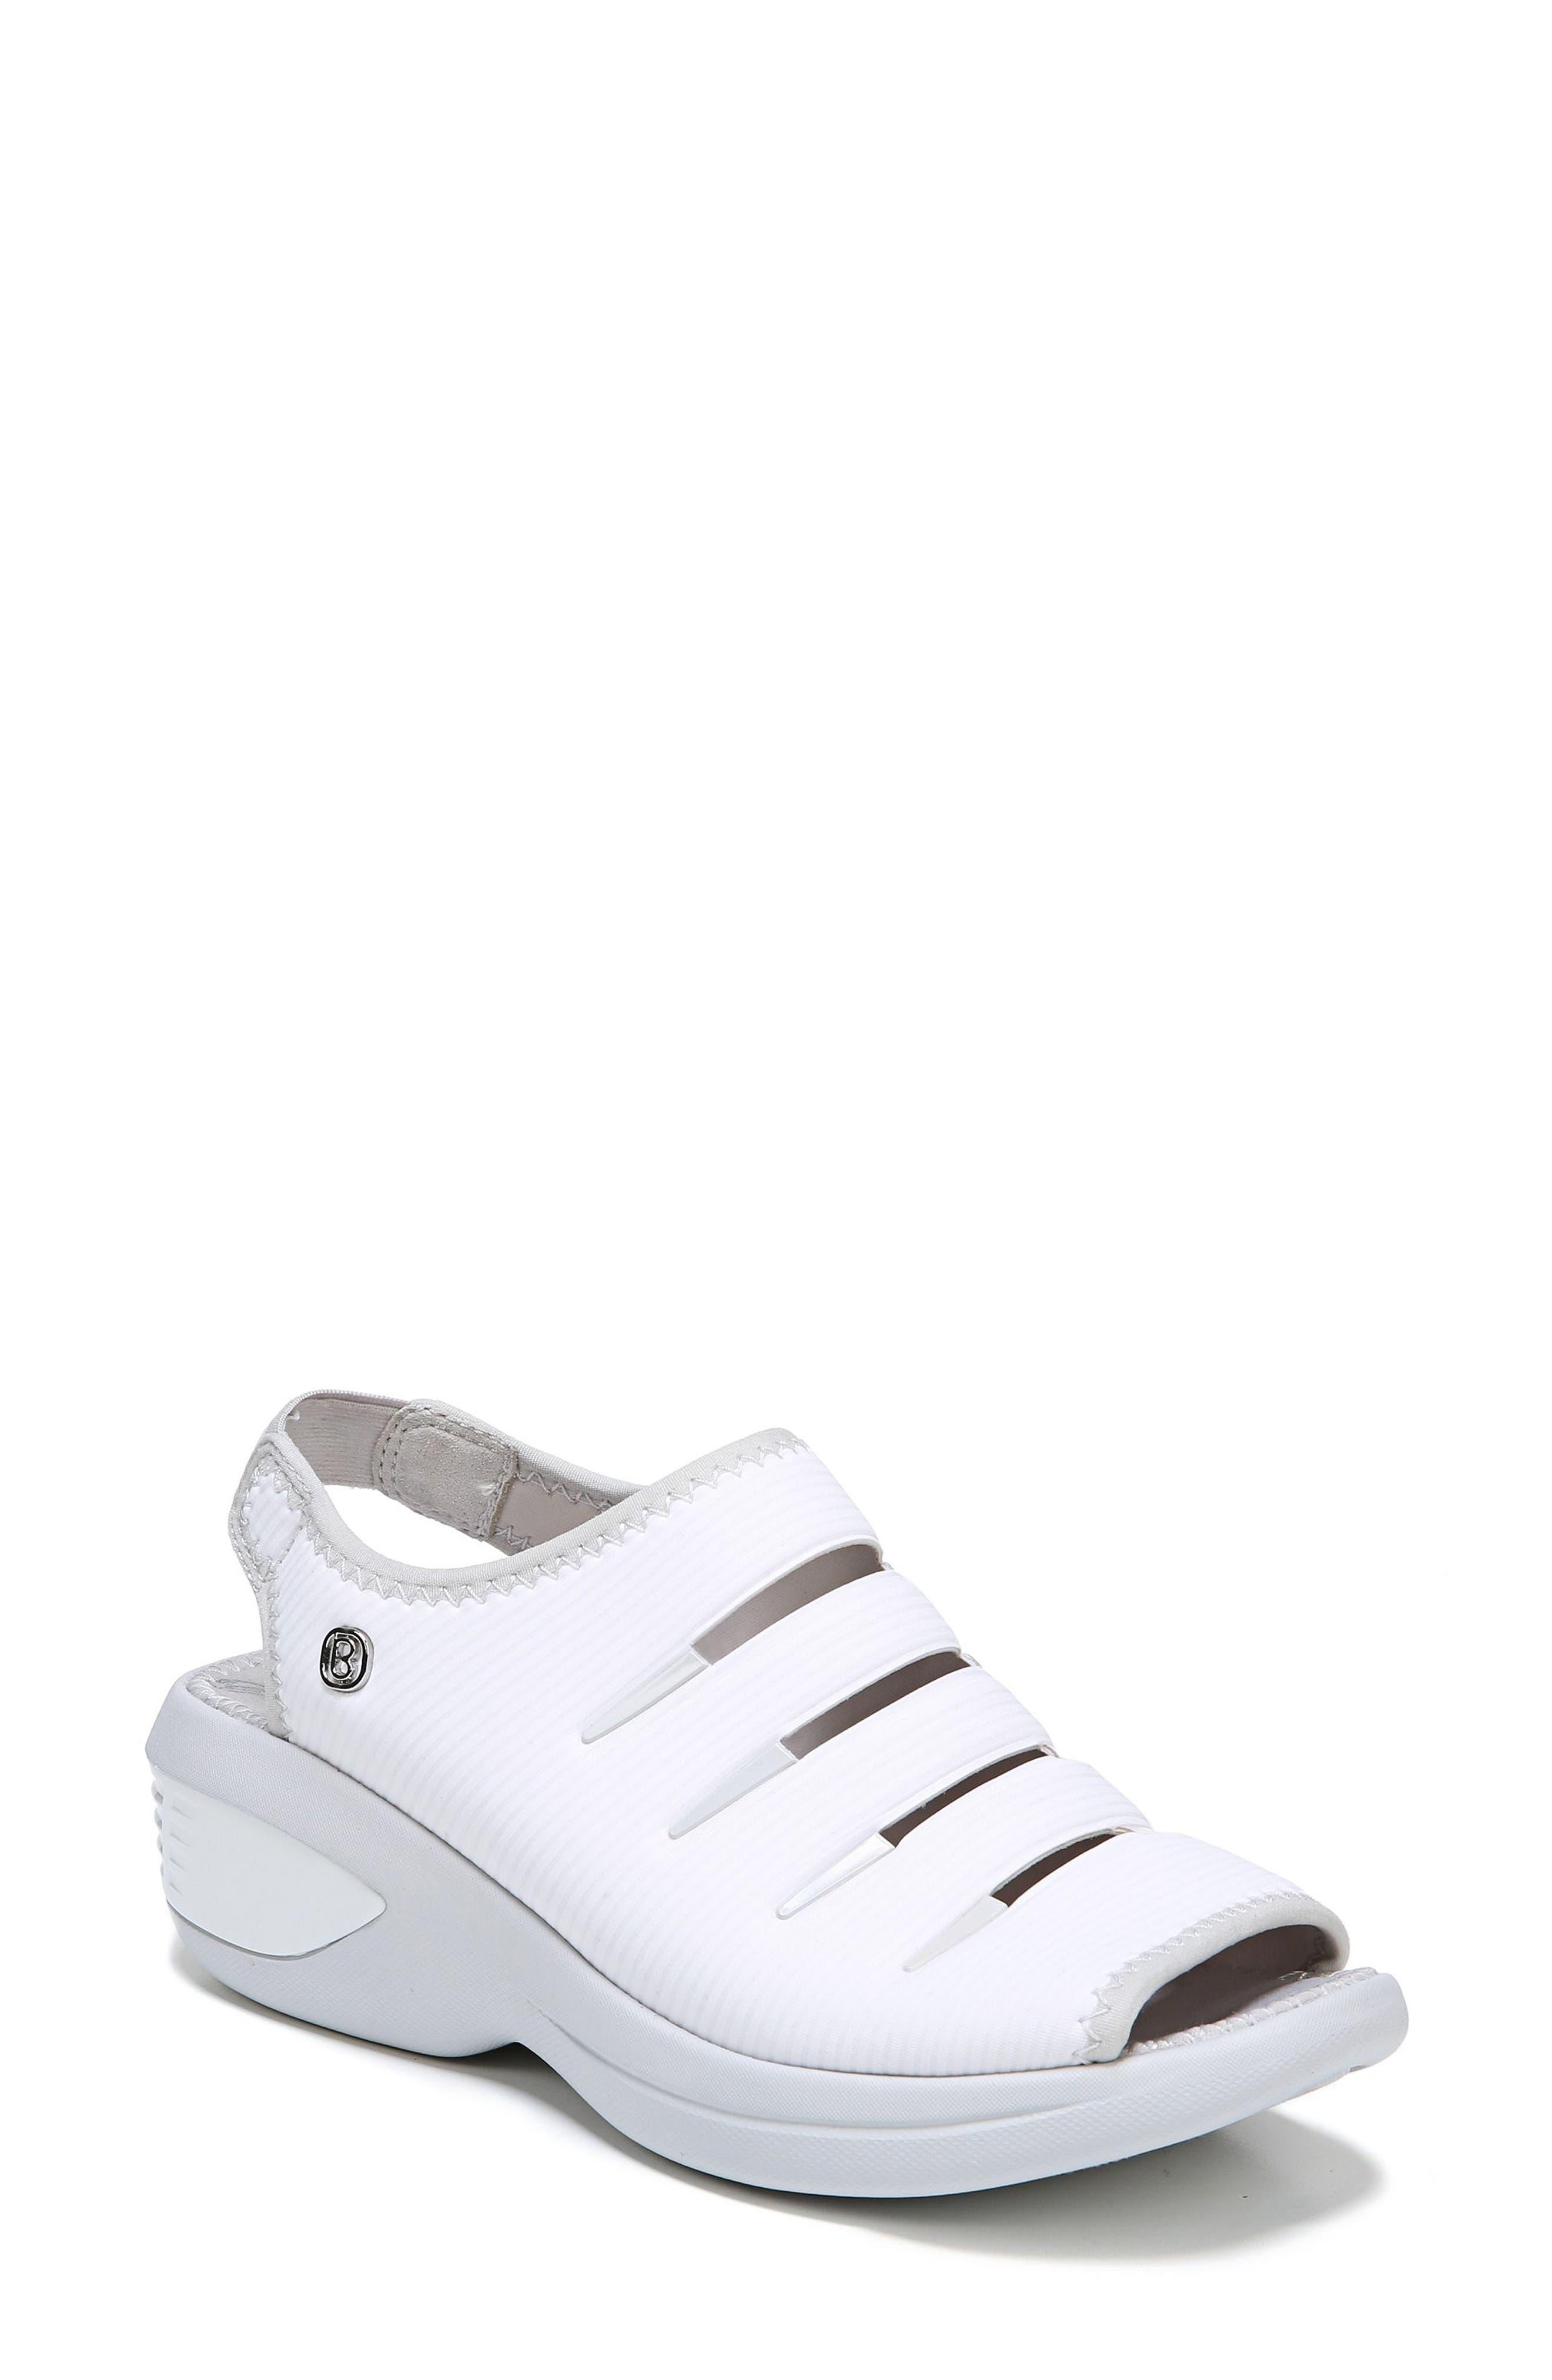 Foxy Sandal,                         Main,                         color, White Fabric